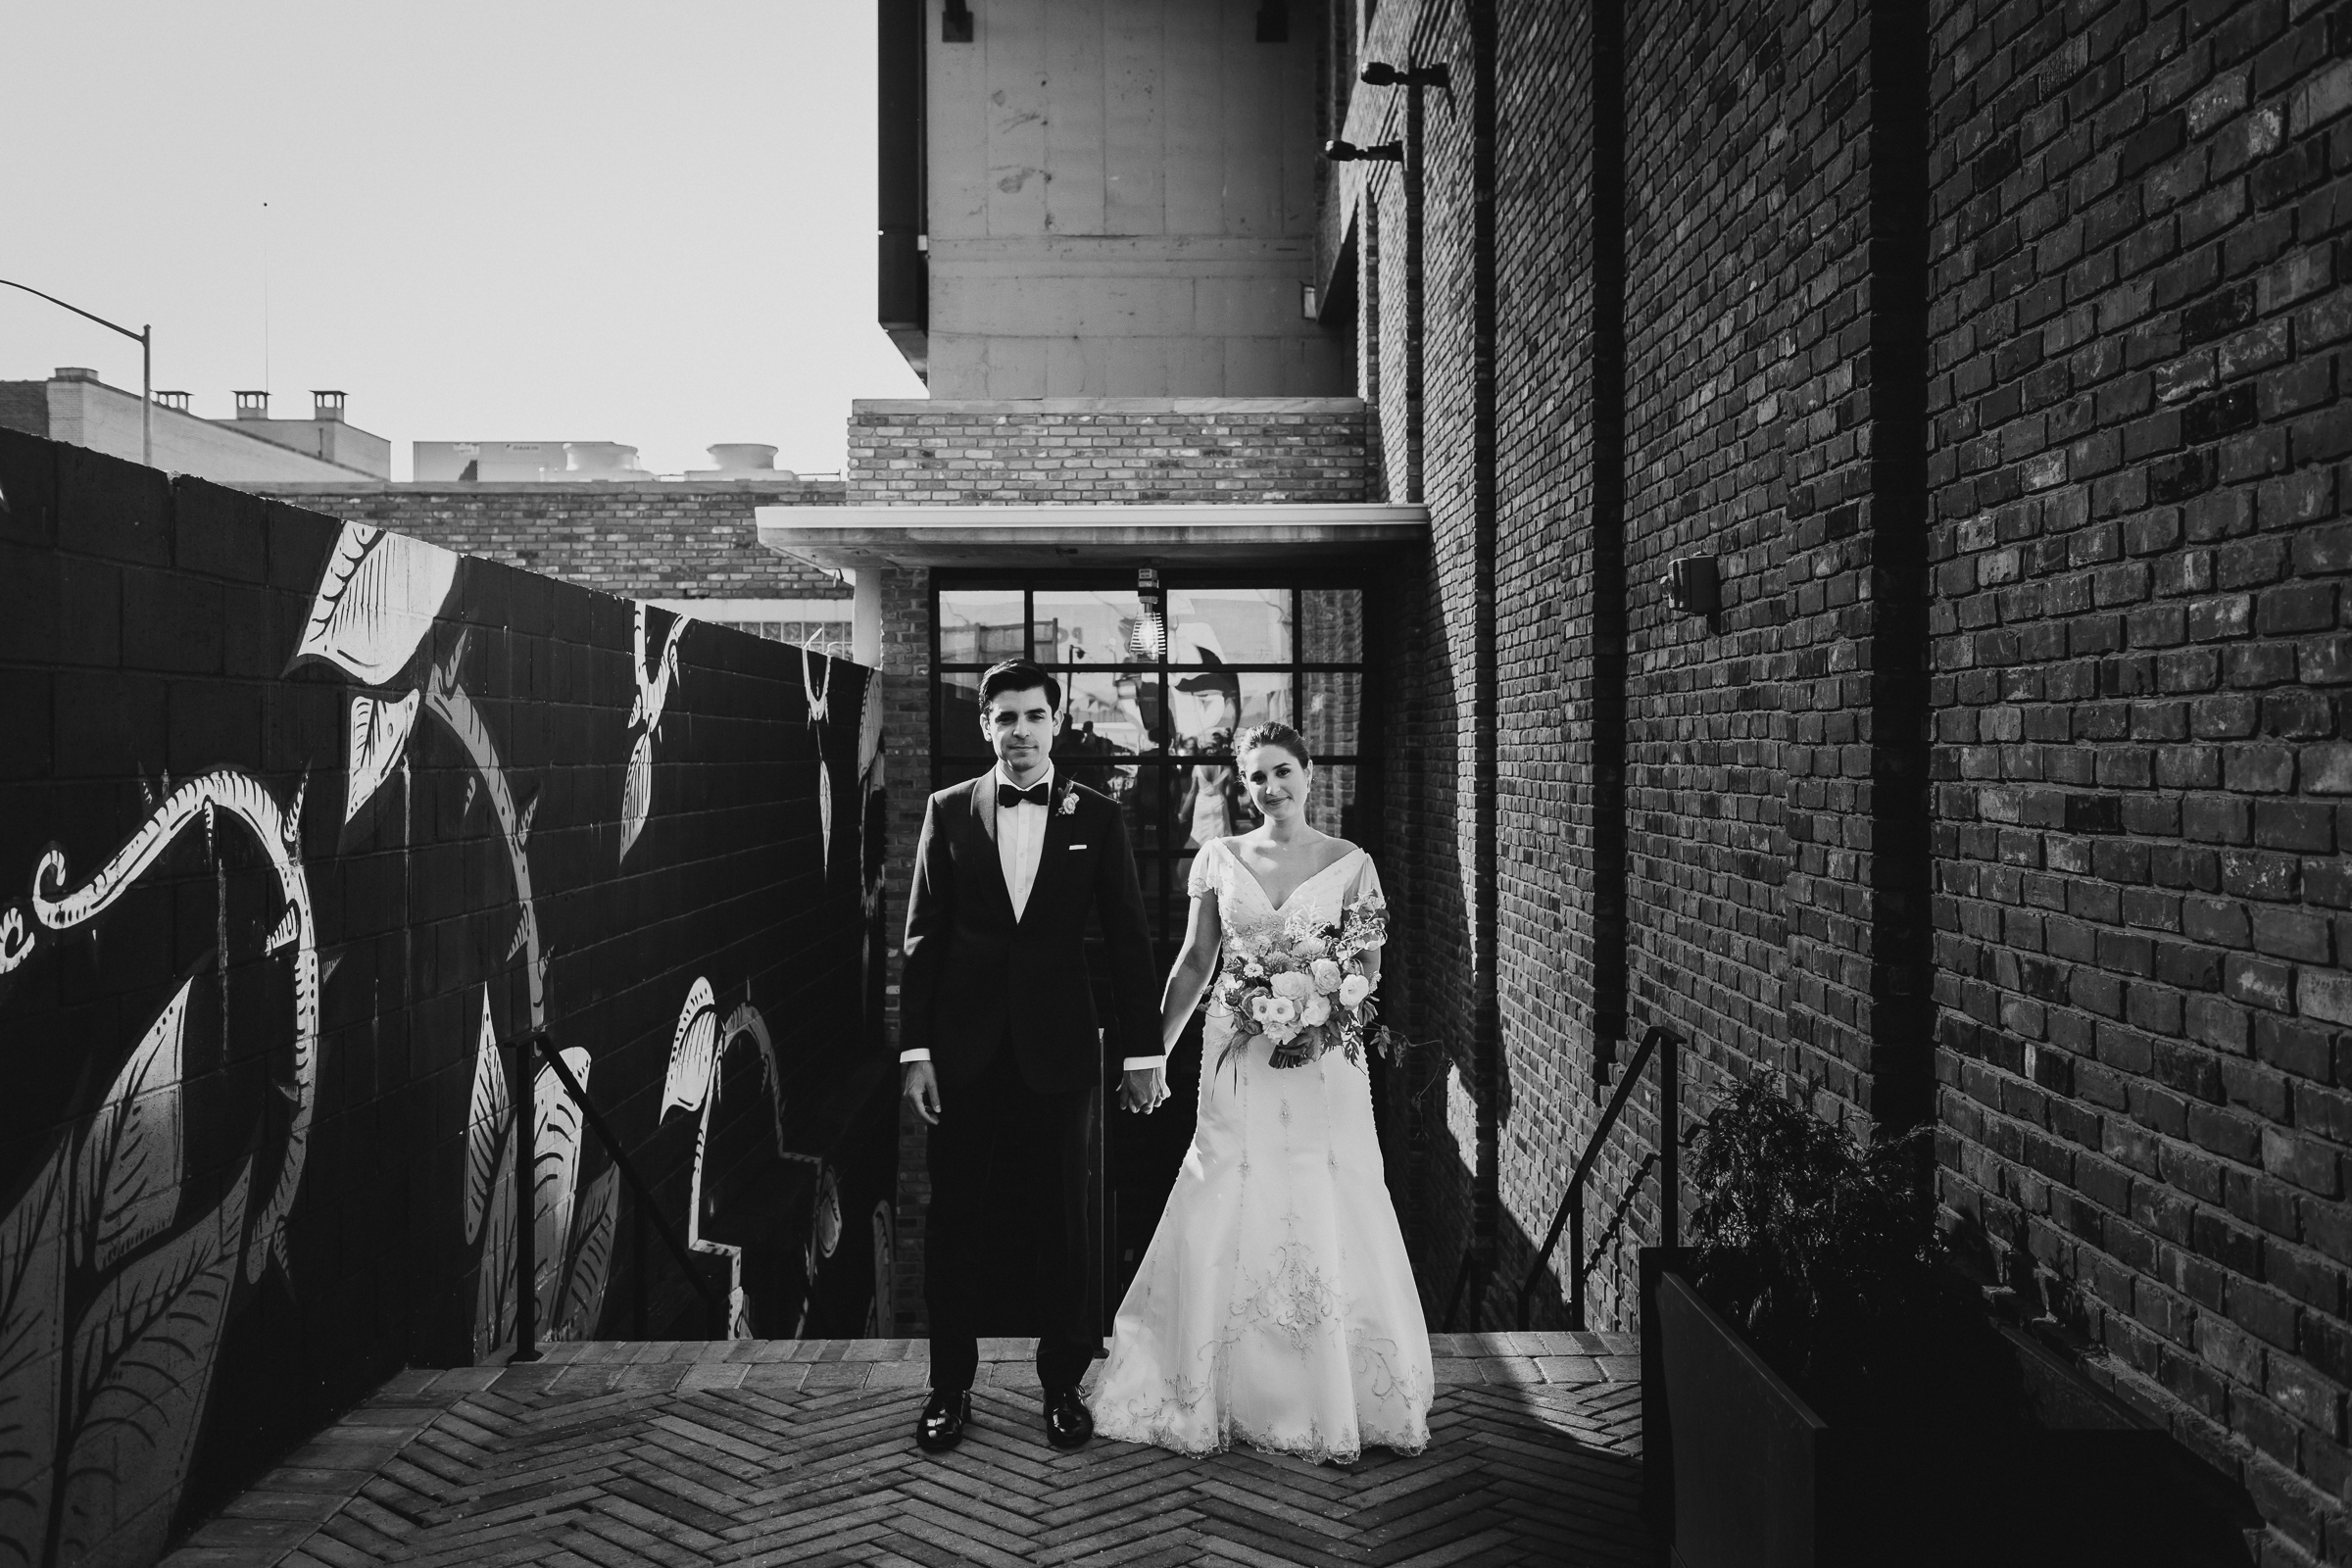 Brooklyn-Winery-NYC-Editorial-Documentary-Wedding-Photographer-Gina-Oli-44.jpg